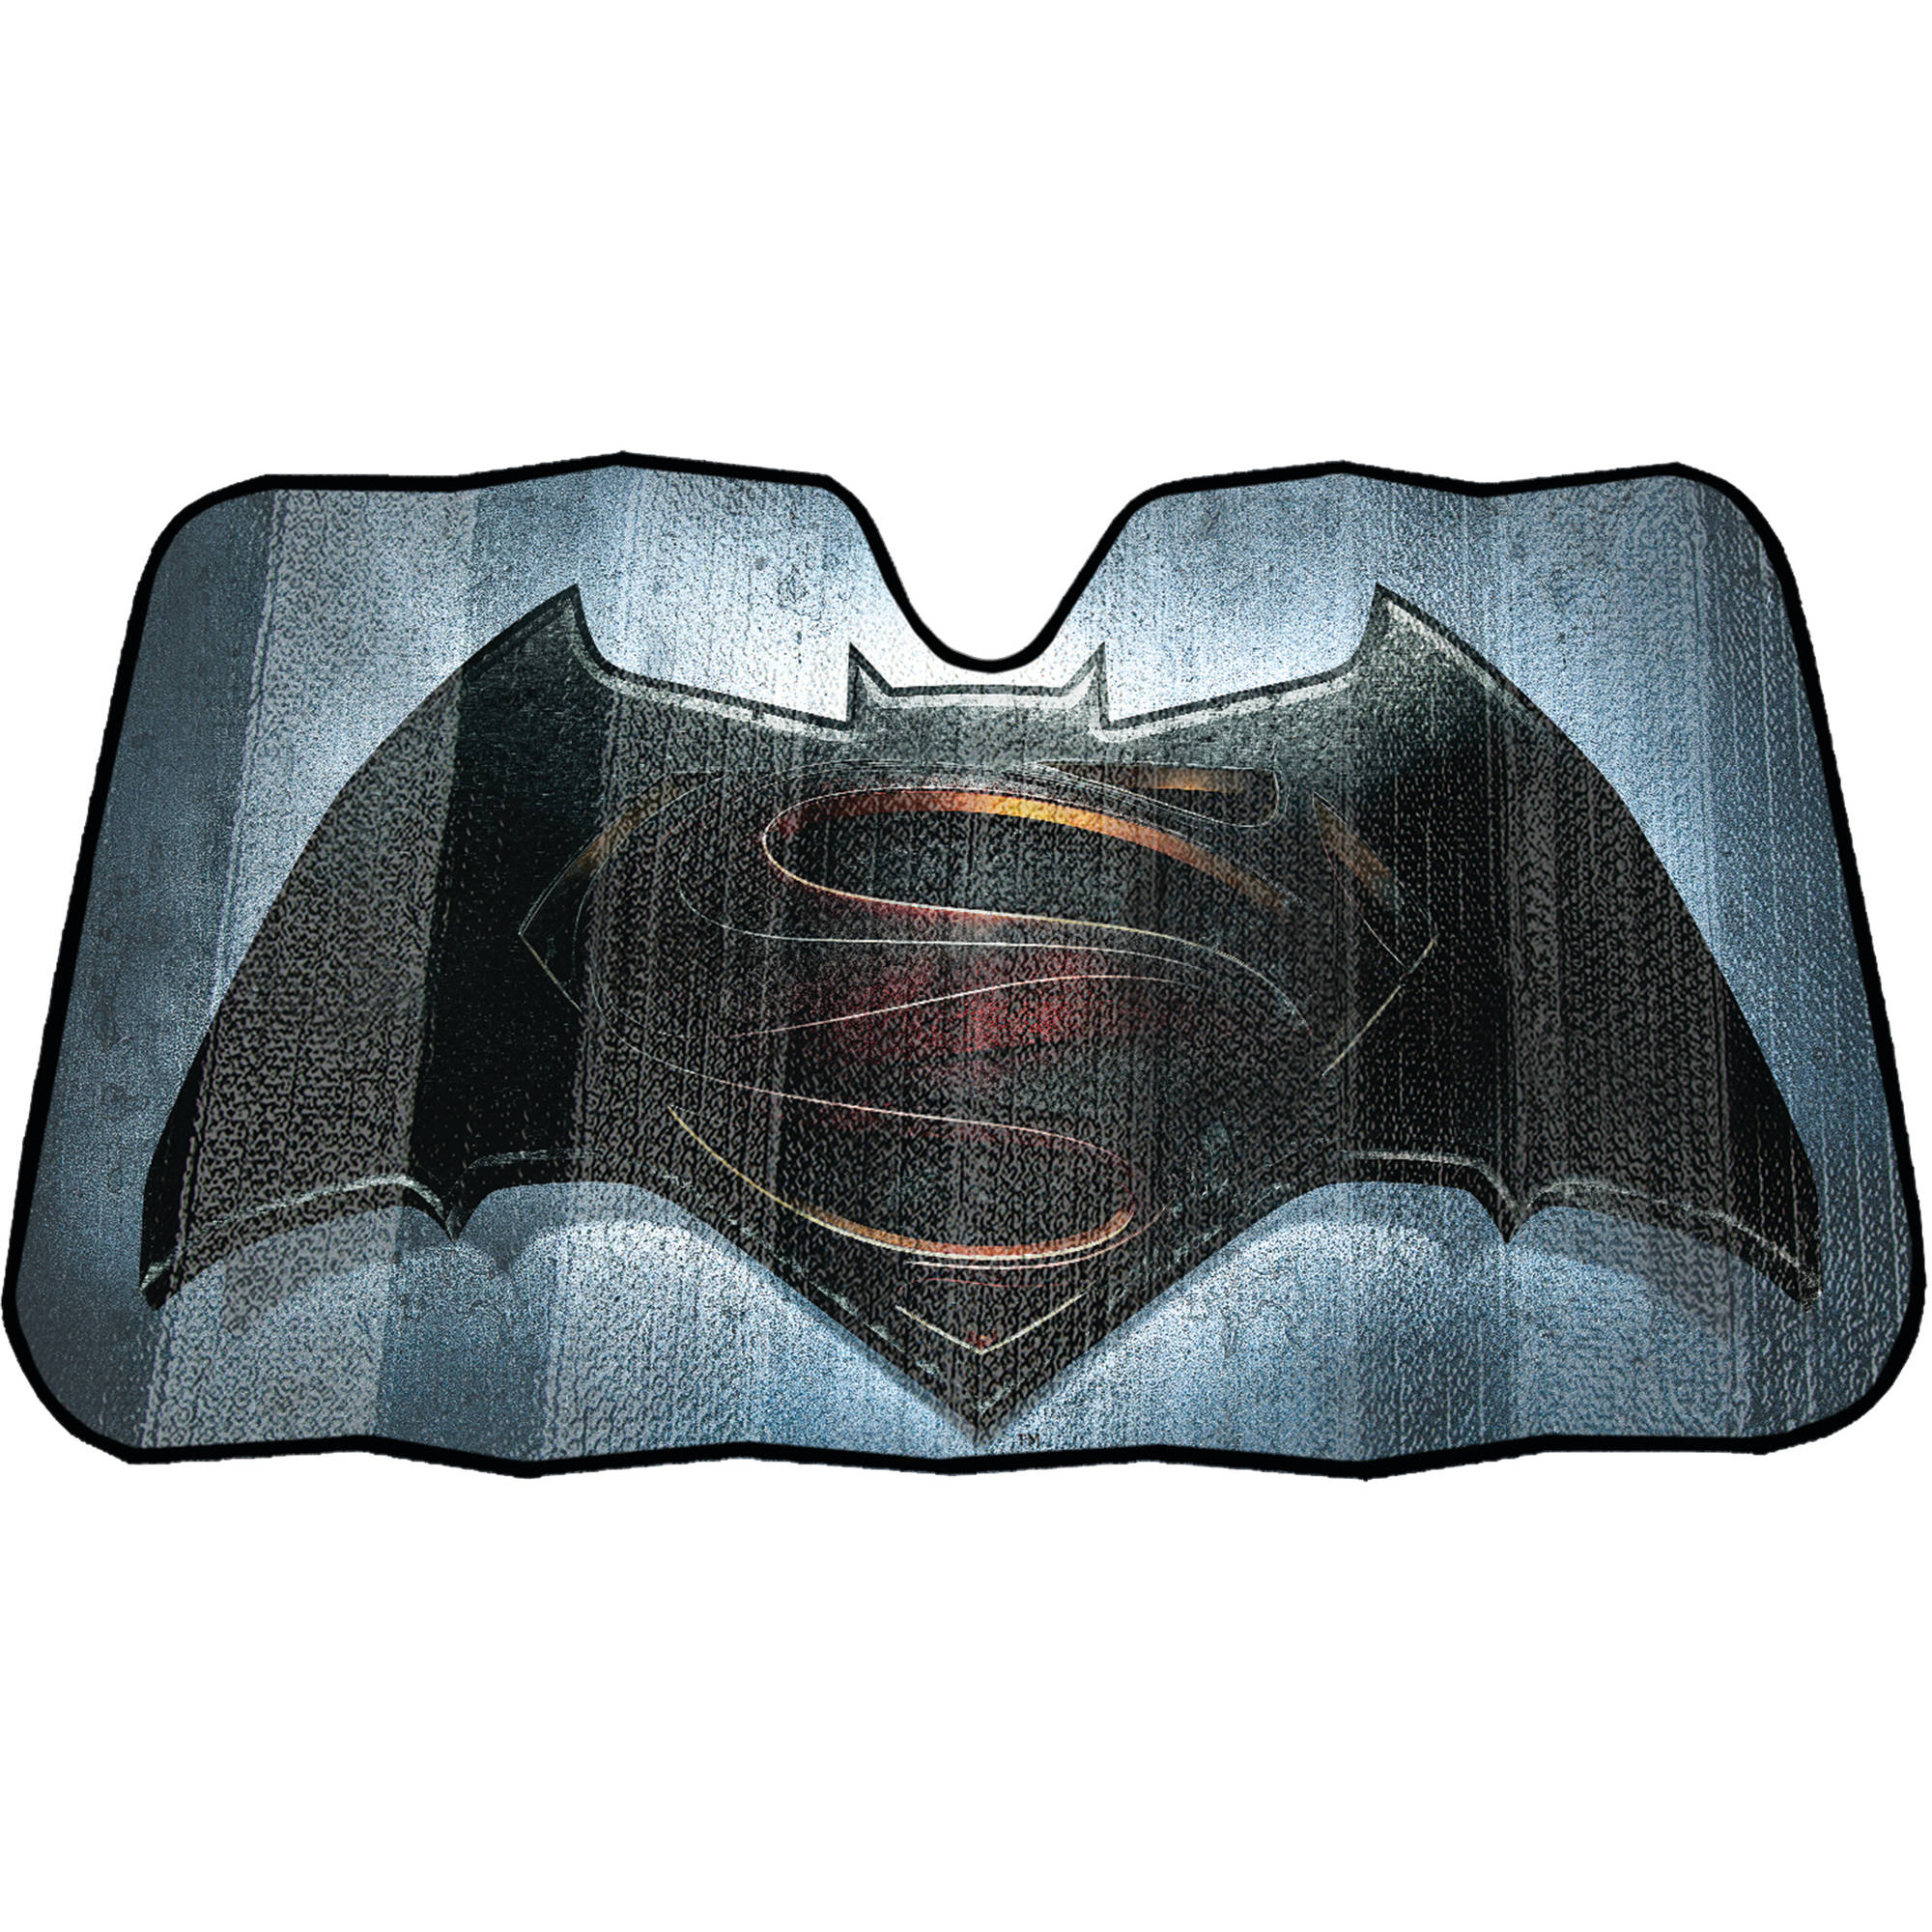 Warner Bros. Batman Vs Superman Accordion Bubble Sunshade